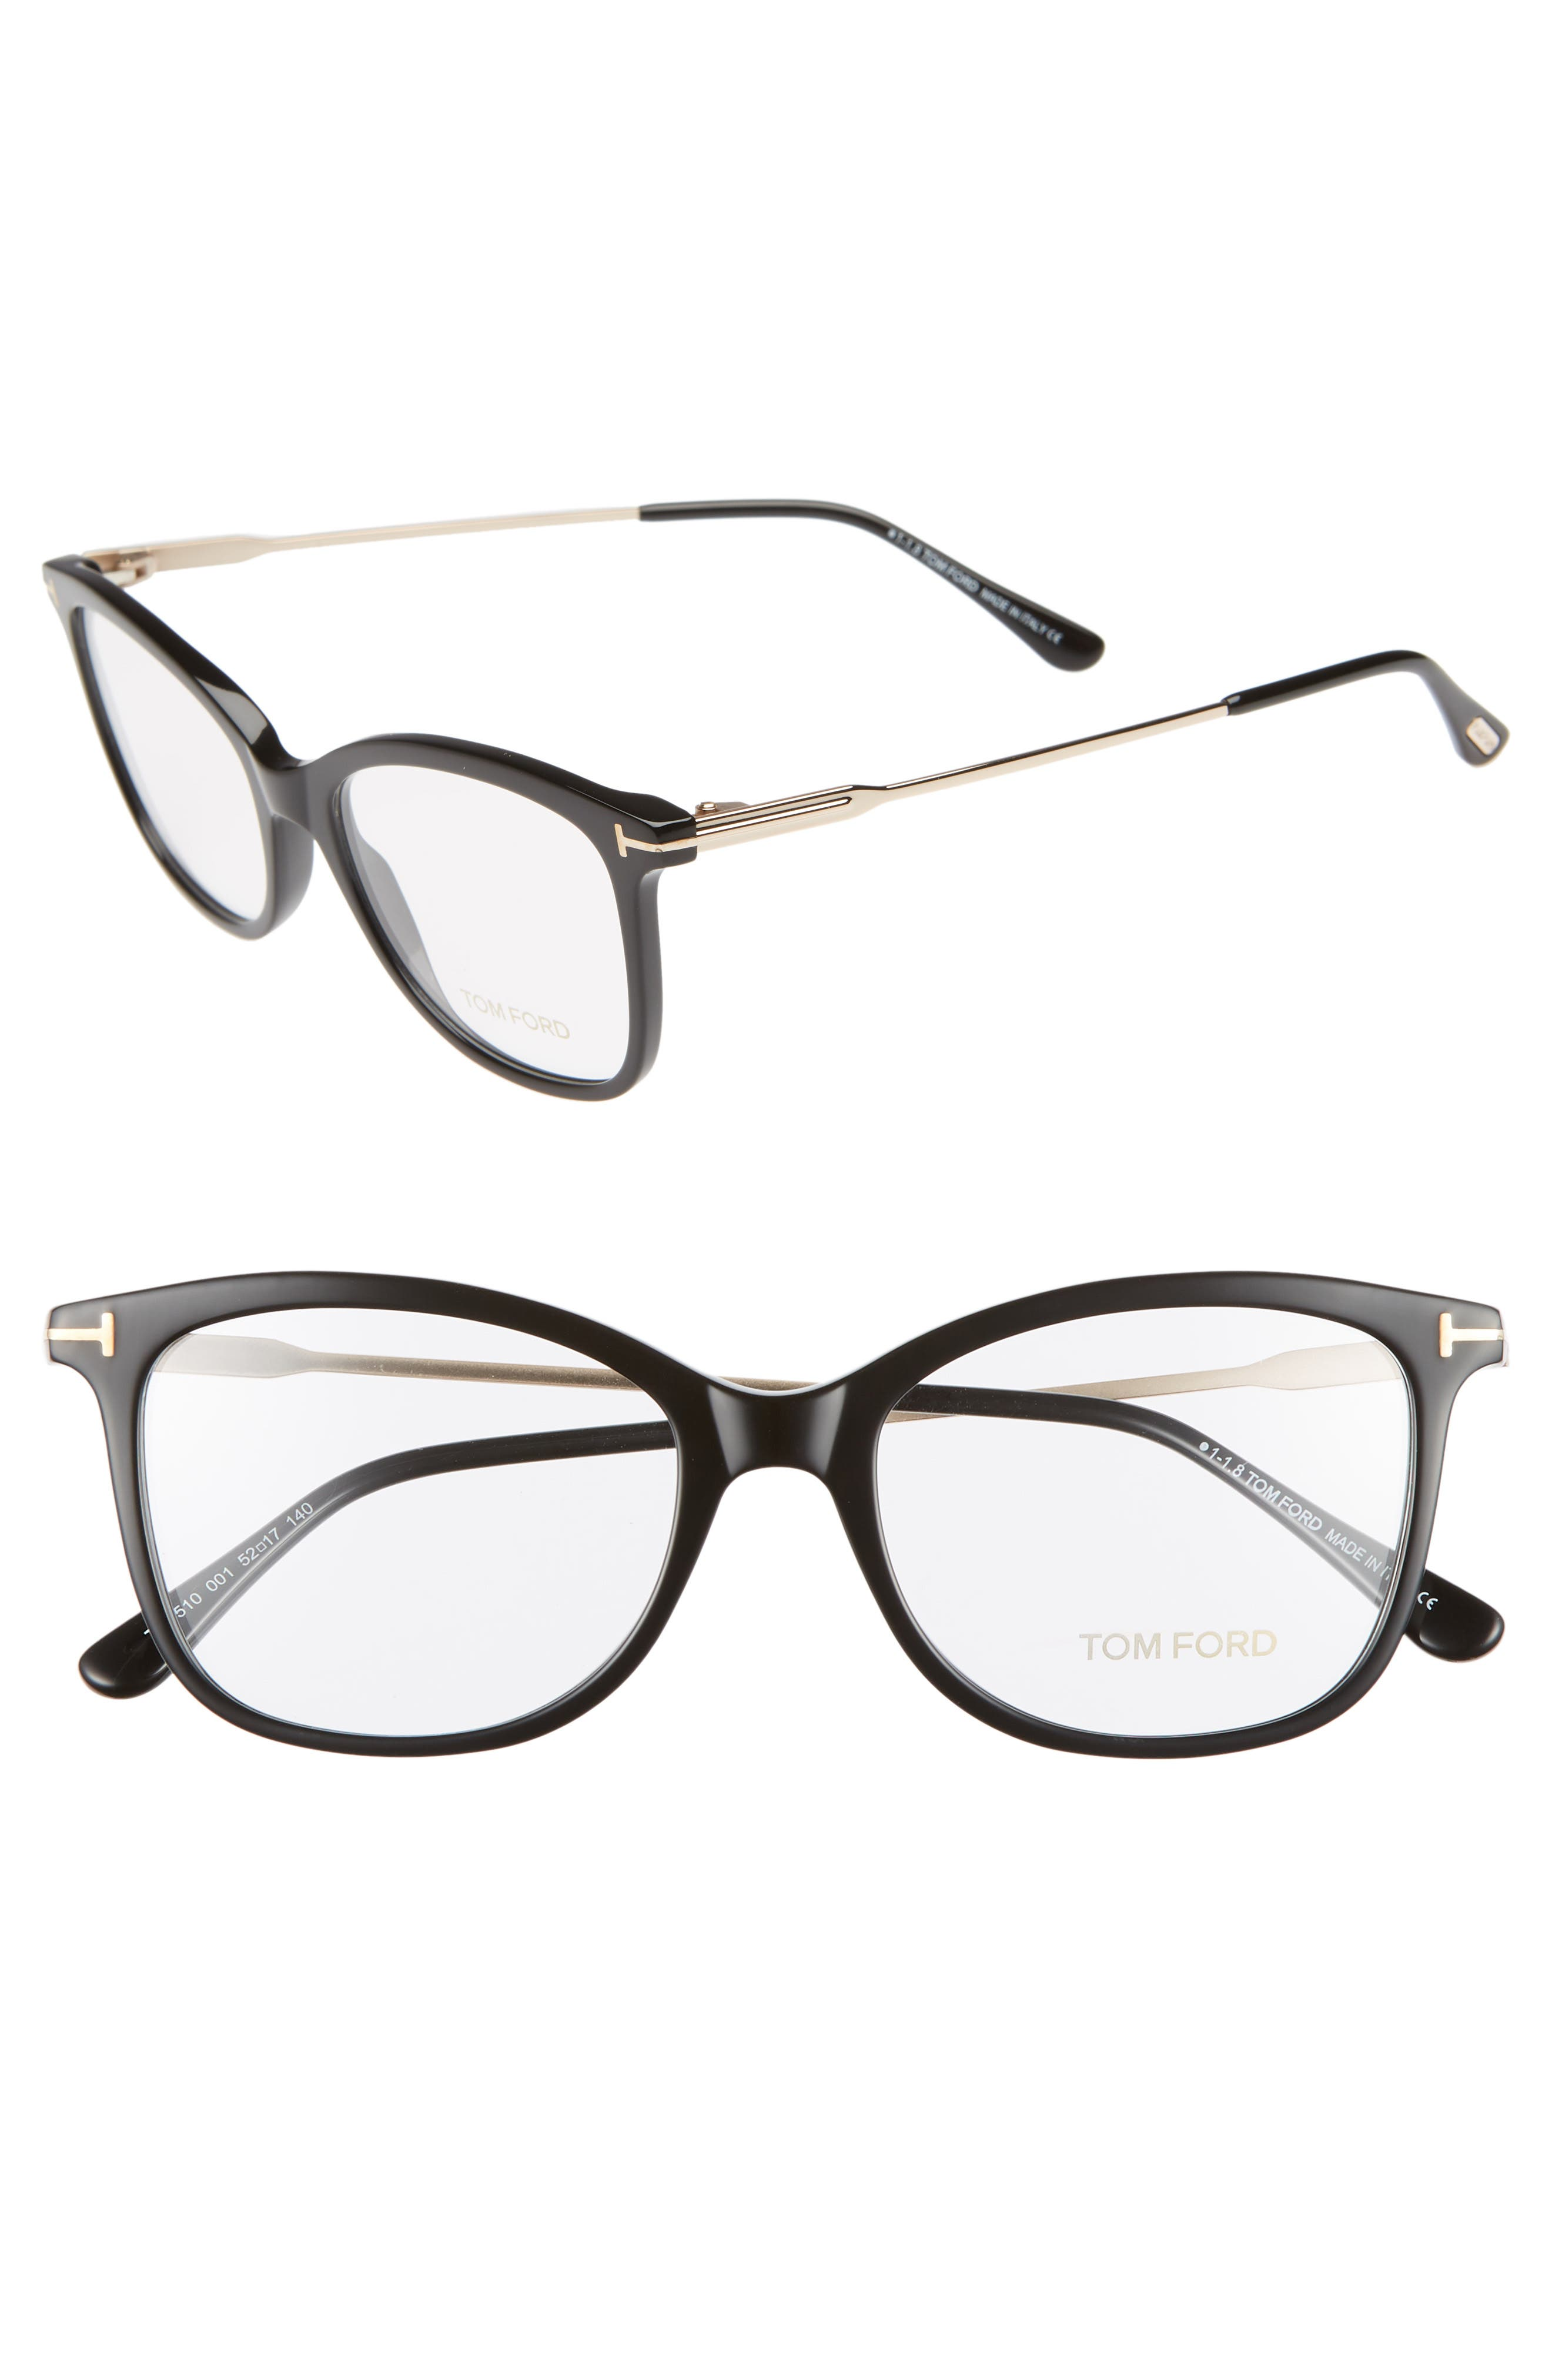 52mm Round Optical Glasses,                             Main thumbnail 1, color,                             SHINY BLACK ACETATE